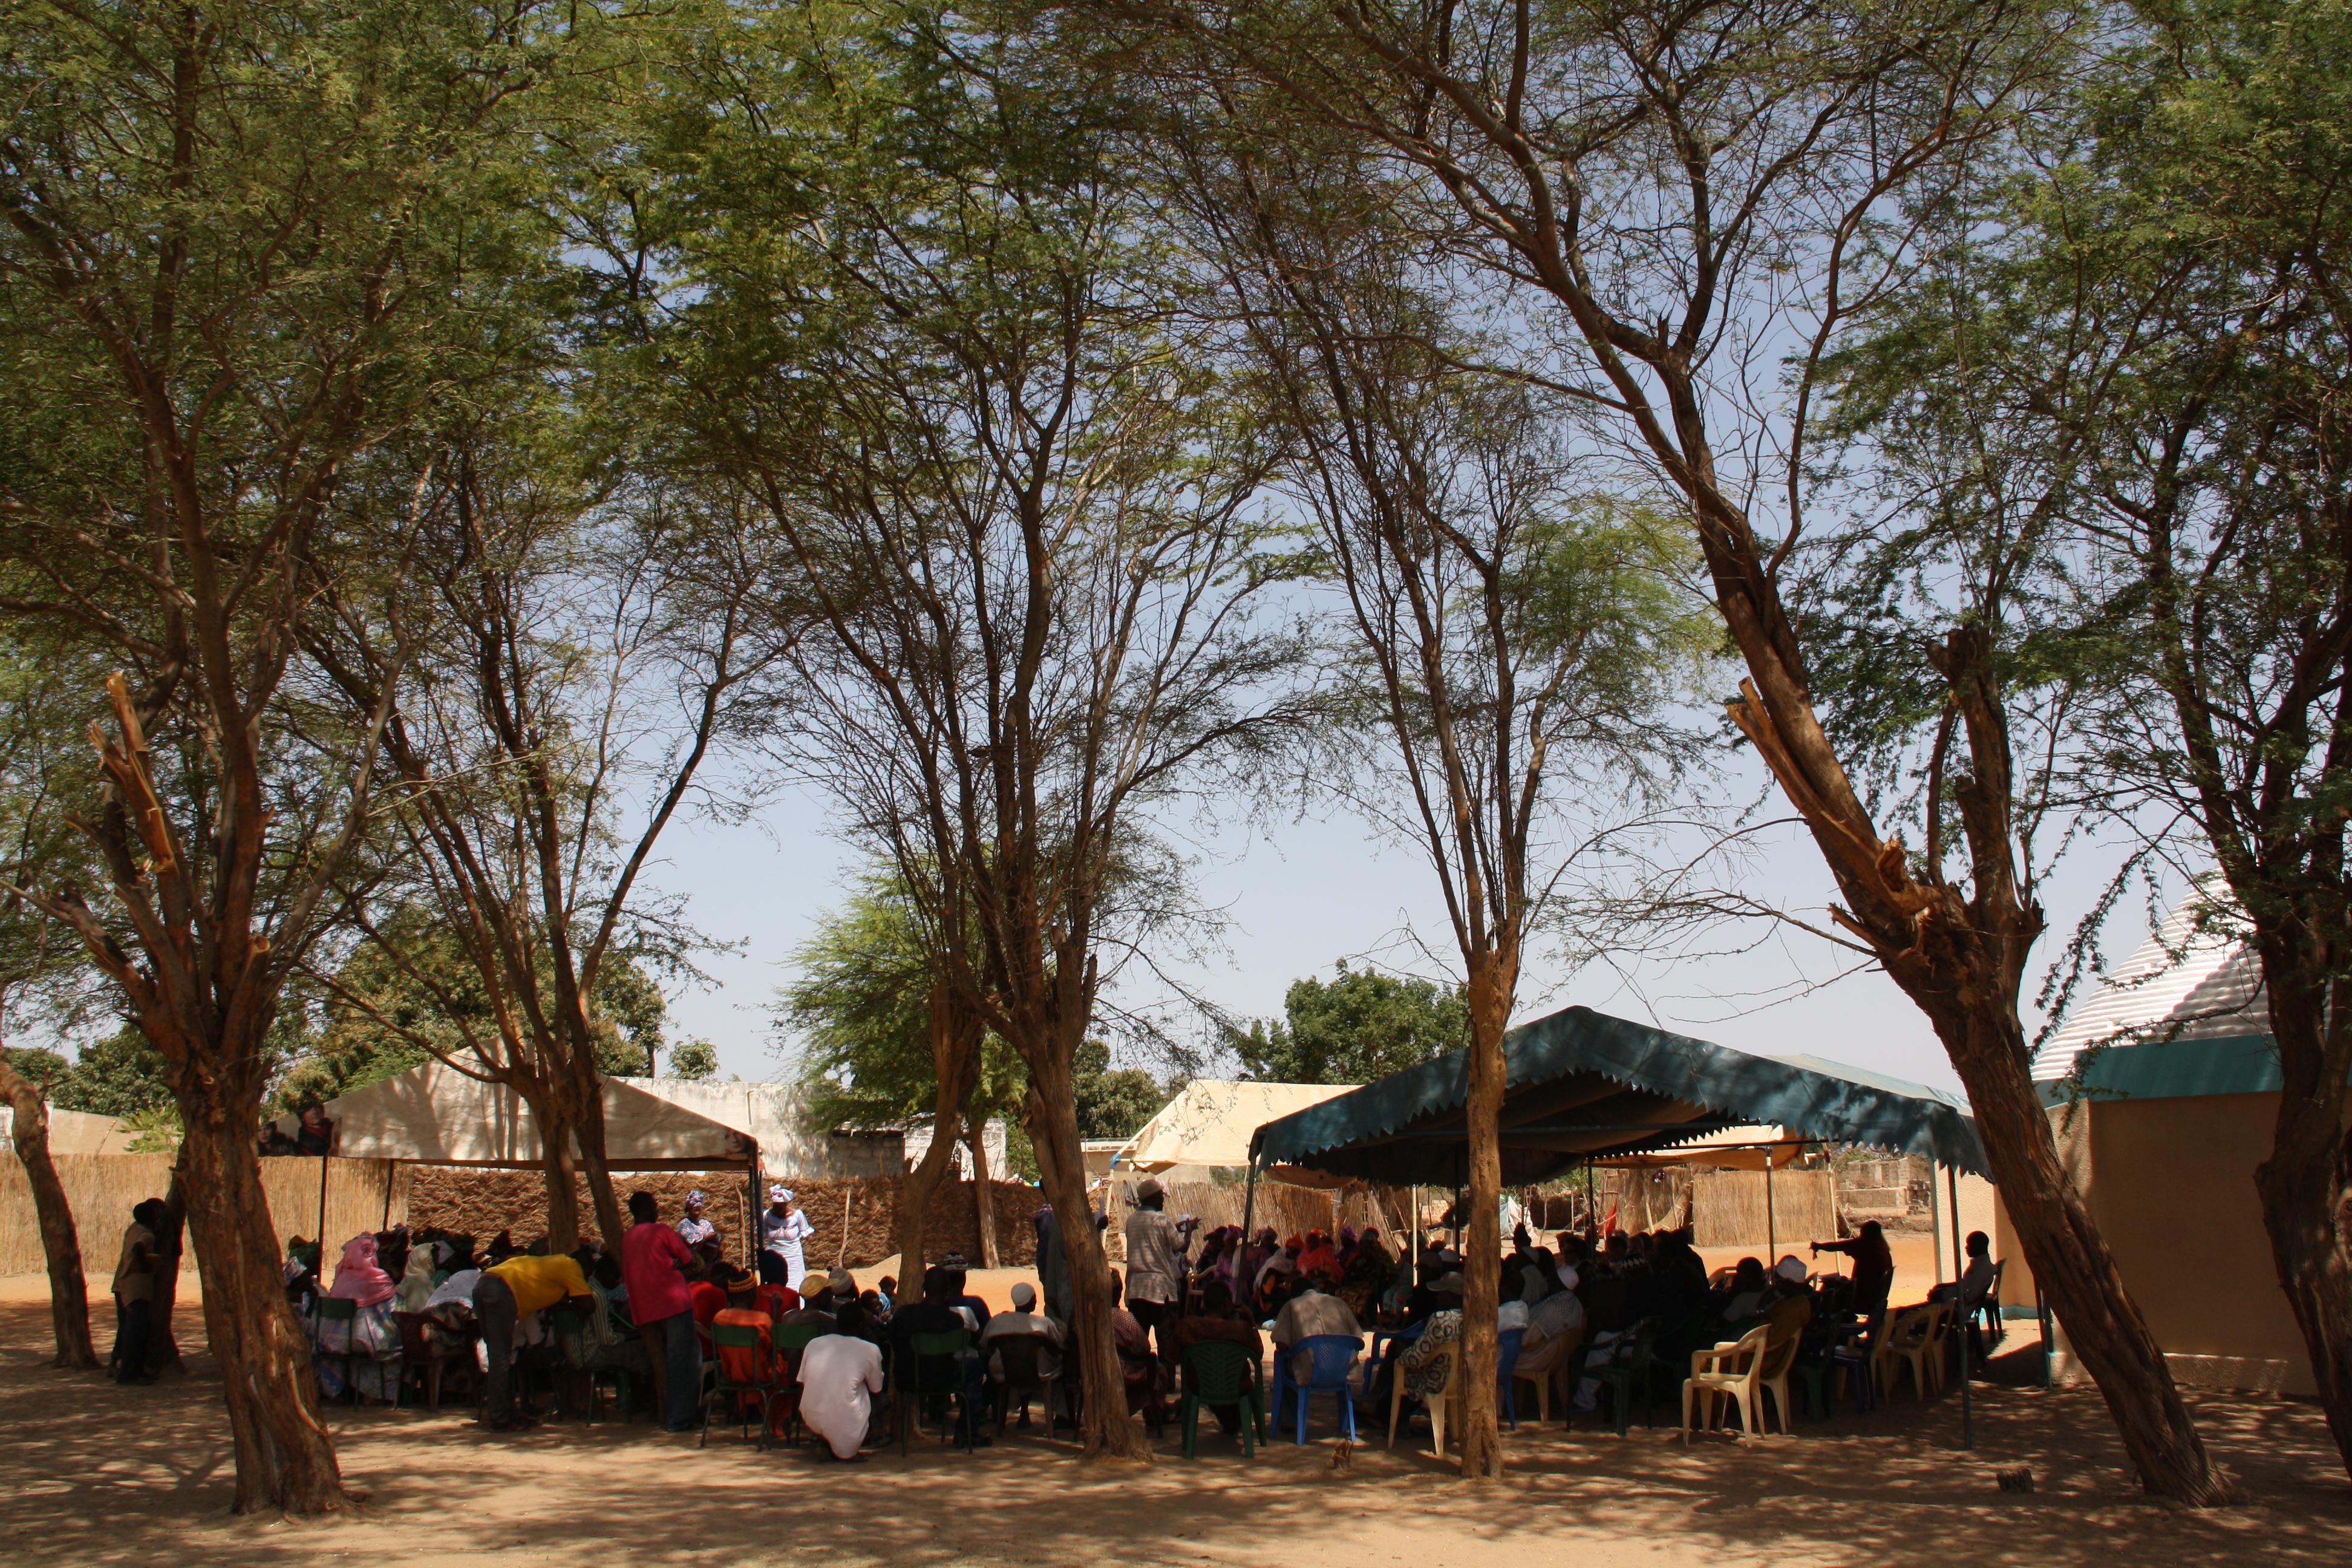 Village gathering (8592452962).jpg